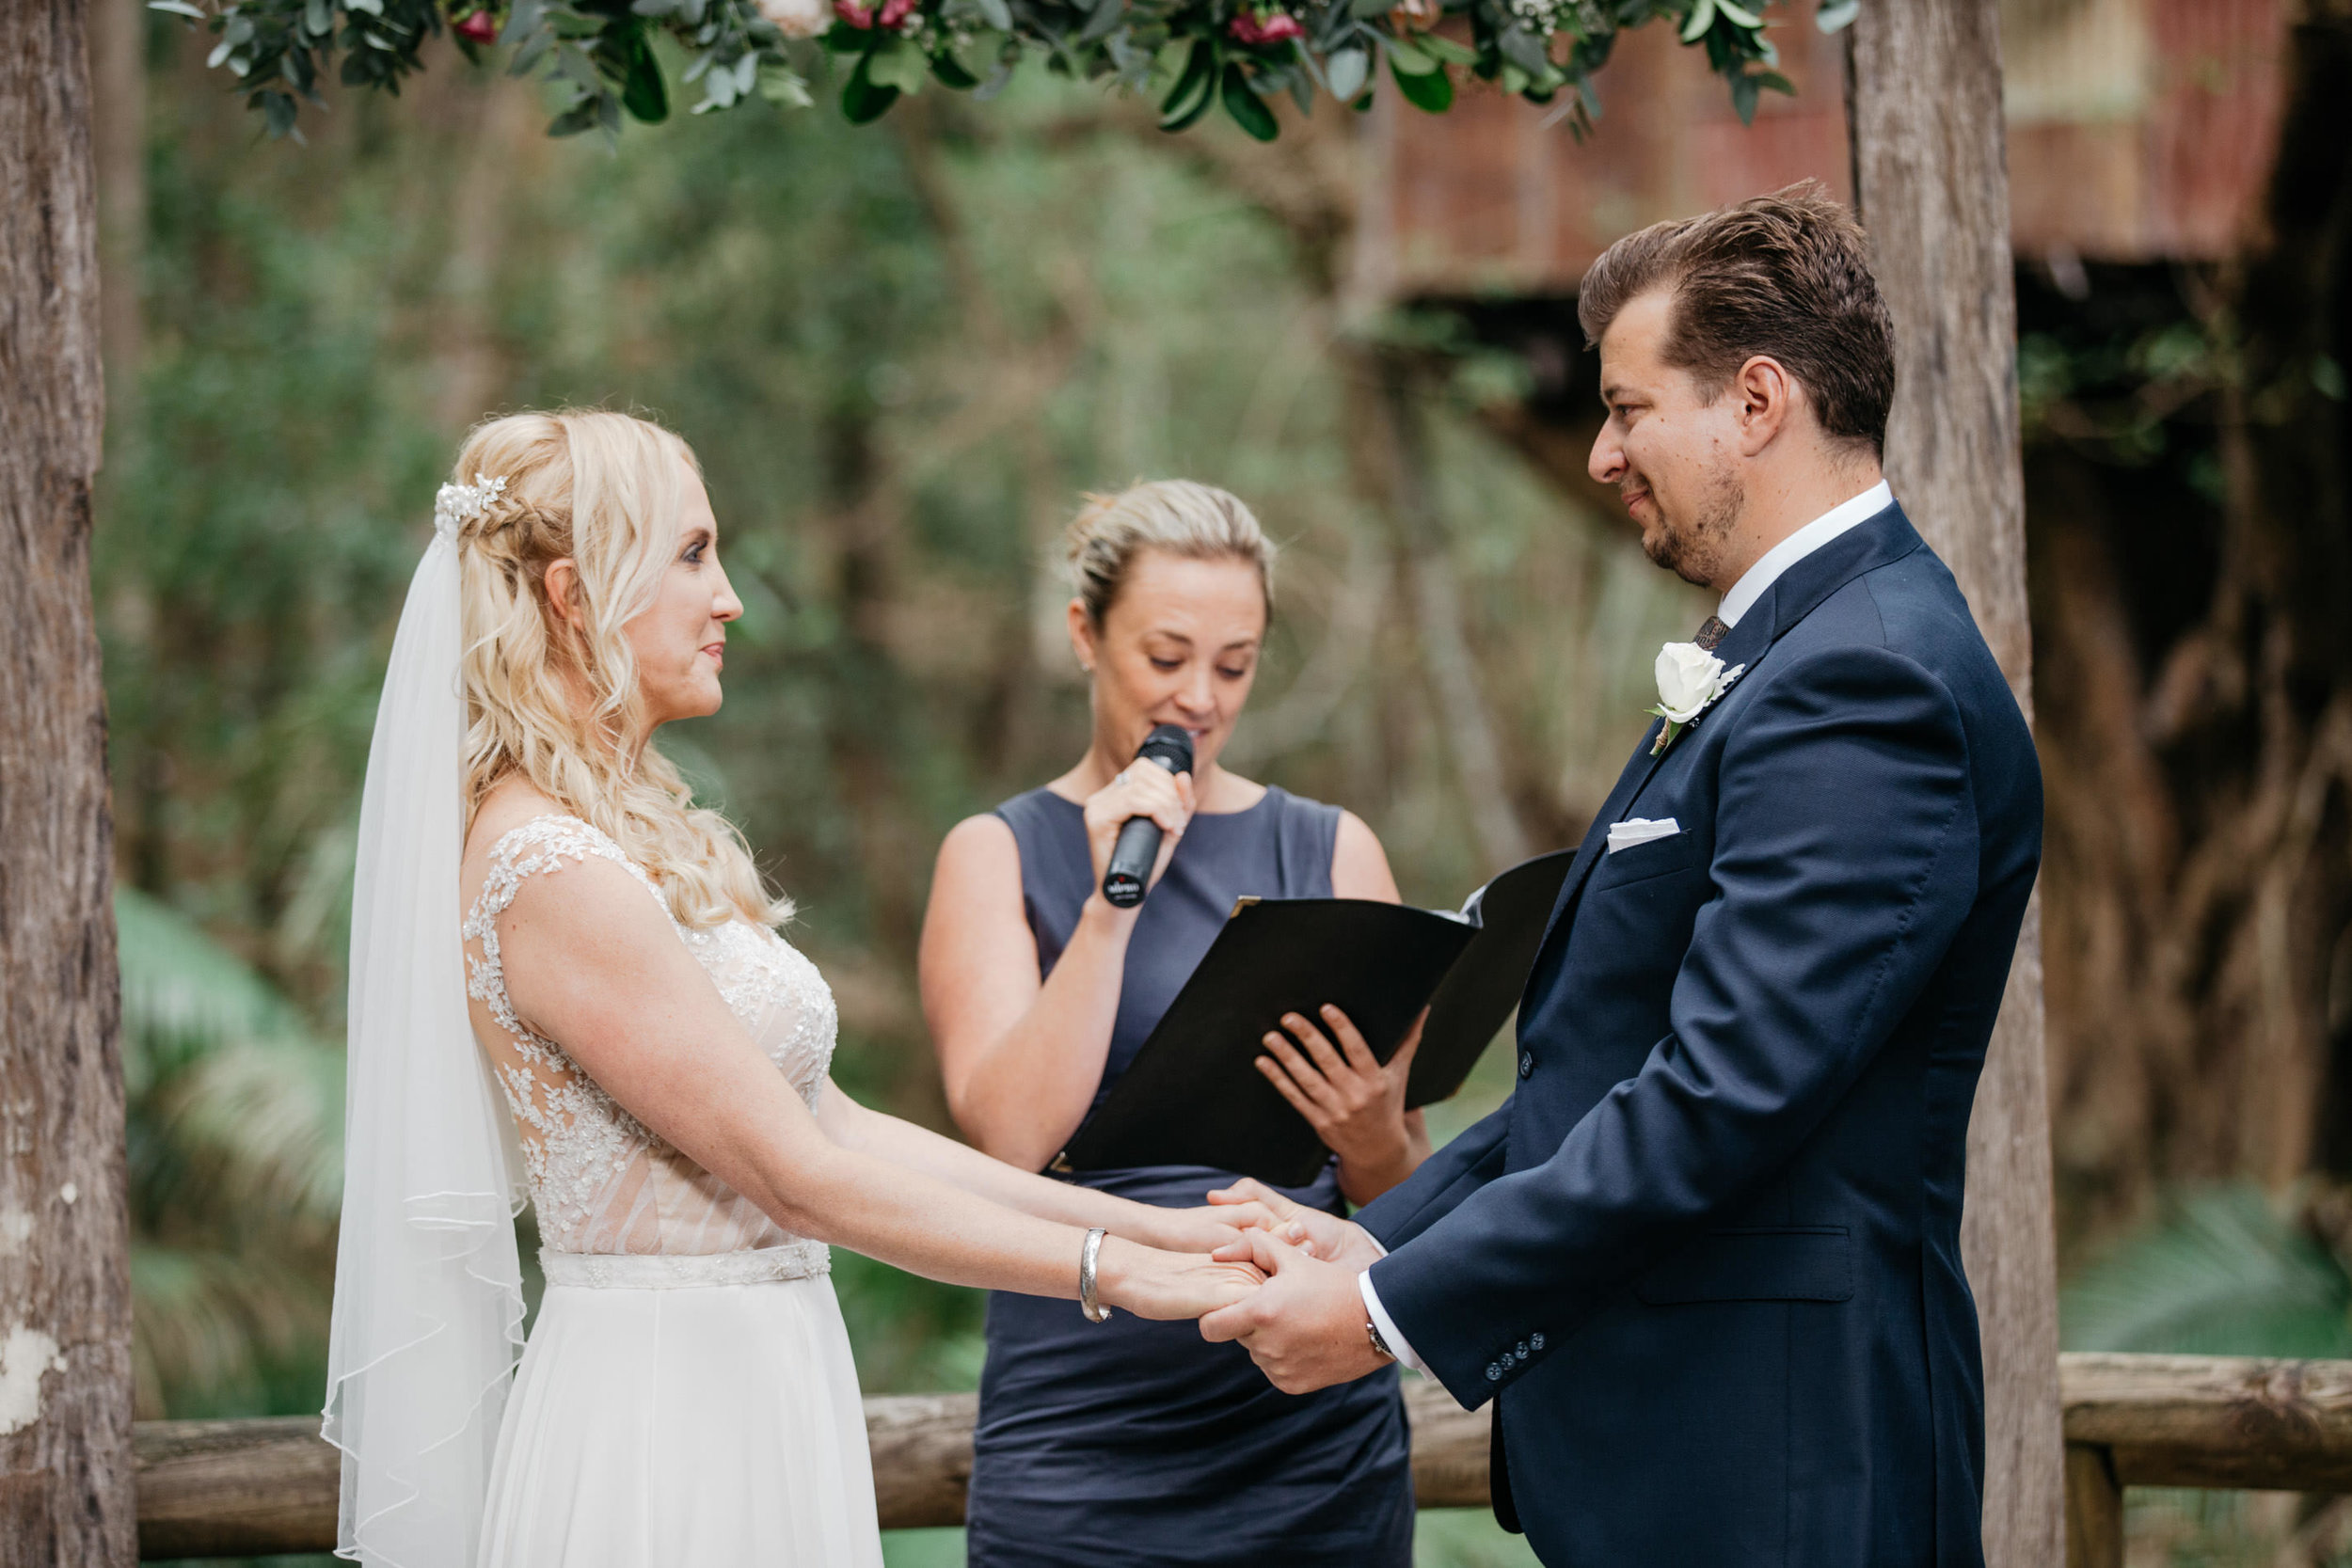 True North Photography_Boomerang Farm_Stacey and Isaac_Gold Coast Wedding_Barm Wedding_Hinterland Wedding-79.jpg